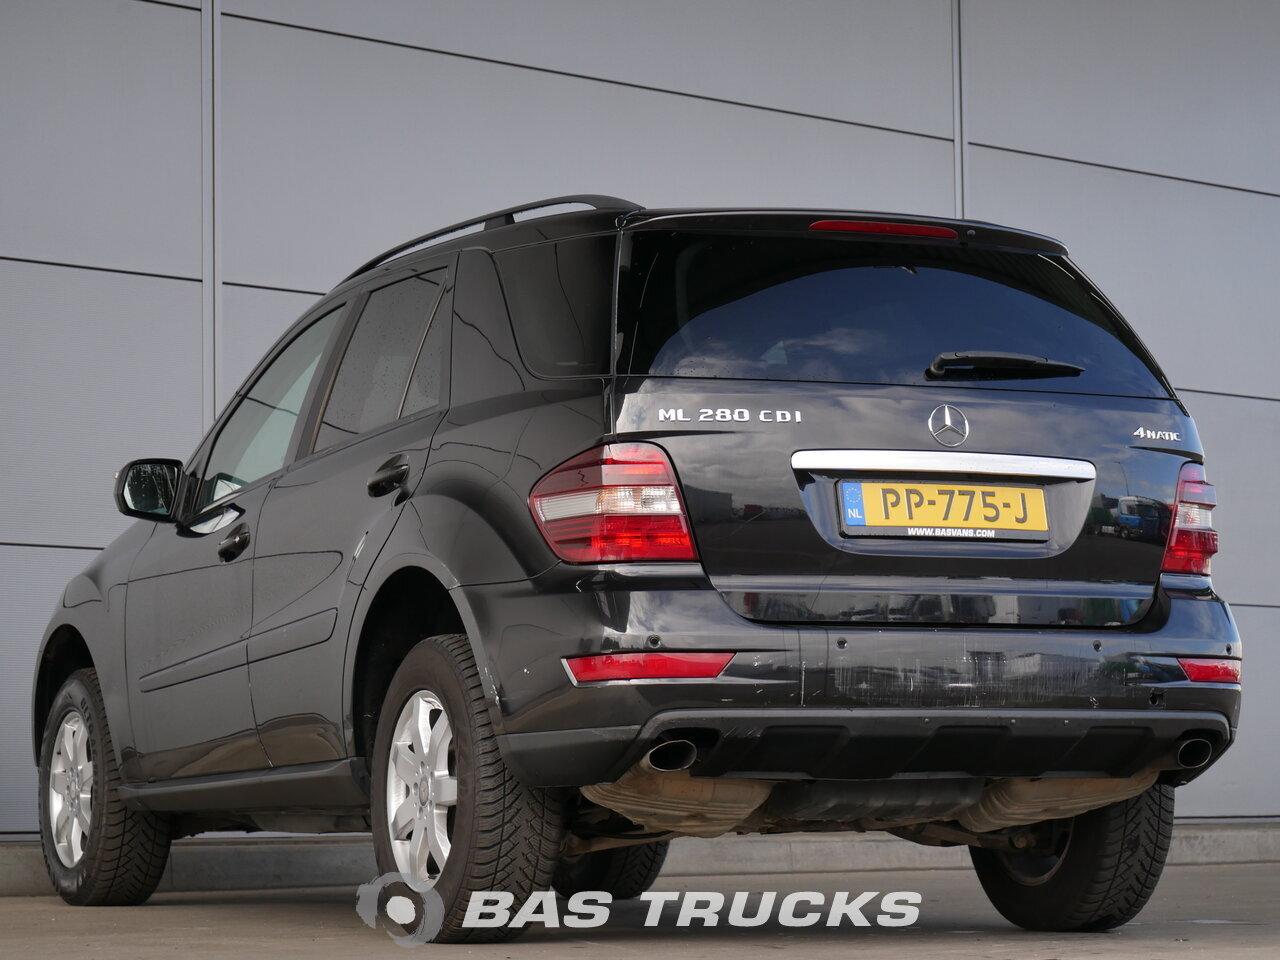 mercedes ml 280 cdi 4matic coche euronorma 0 13600 bas trucks. Black Bedroom Furniture Sets. Home Design Ideas